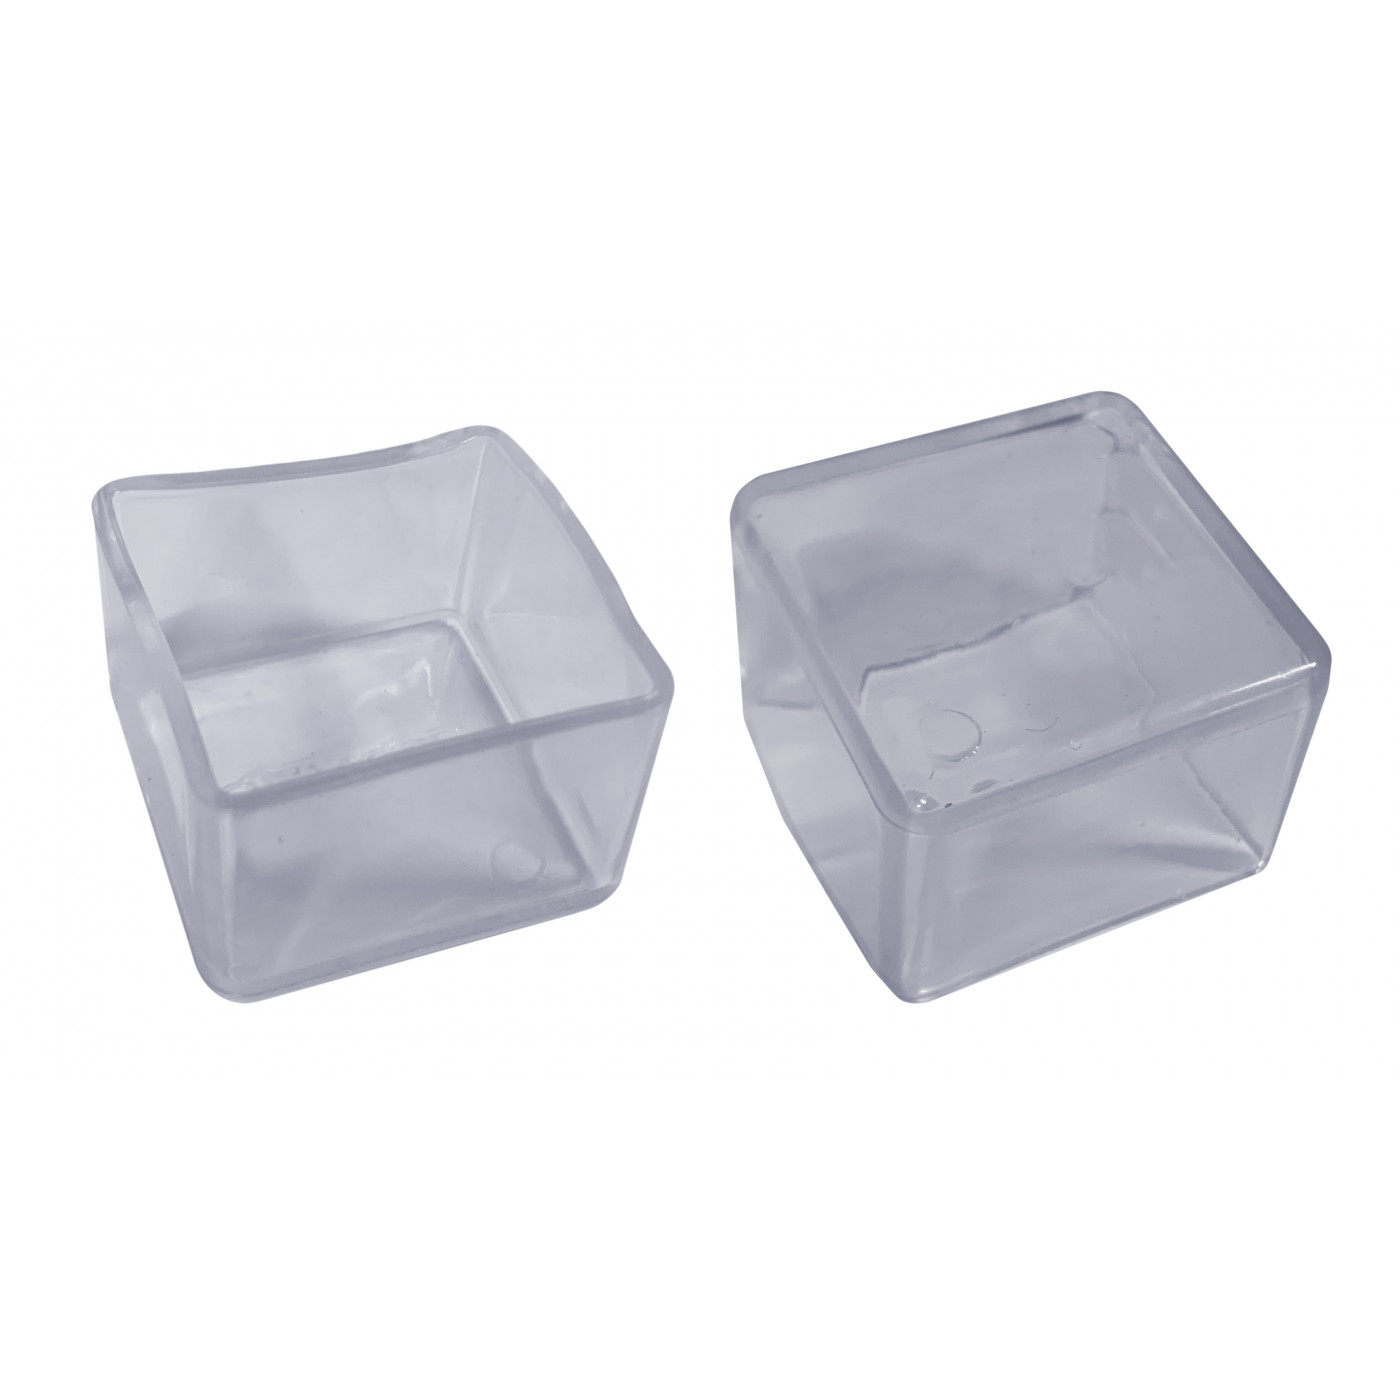 Set von 32 silikonkappen (Außenkappe, Quadrat, 20 mm